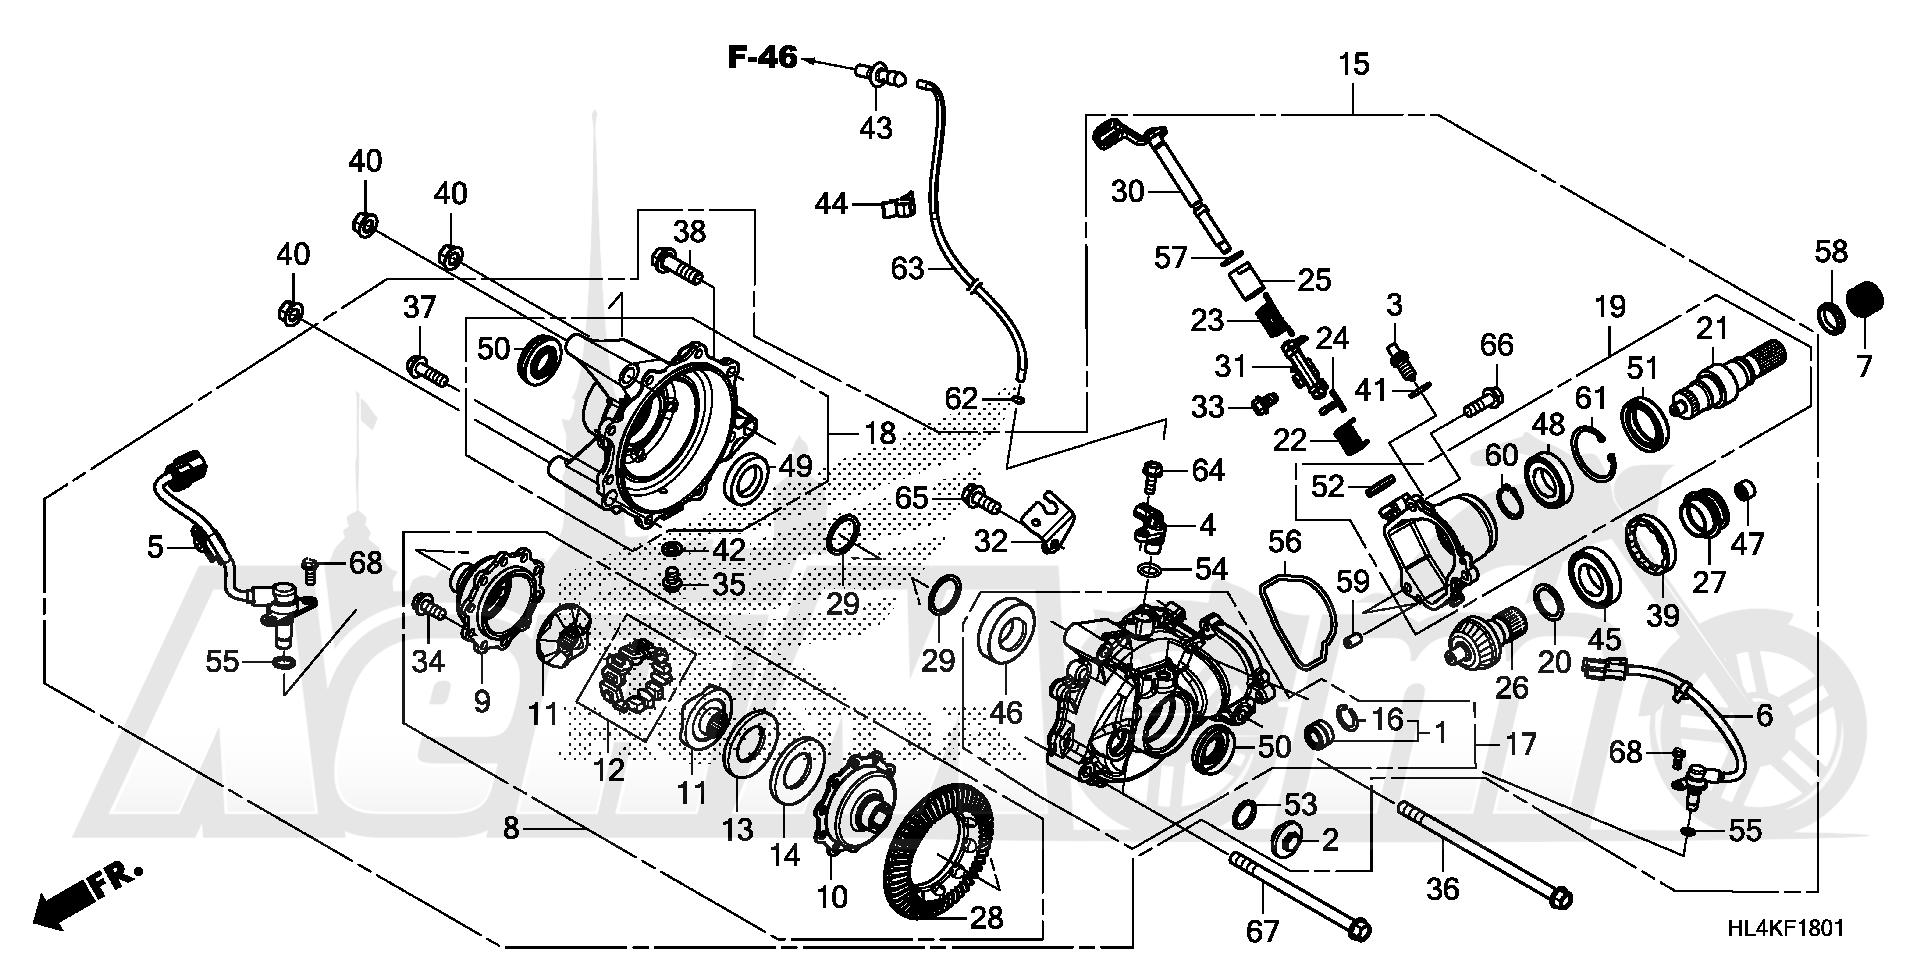 Запчасти для Квадроцикла Honda 2019 SXS1000M3P Раздел: FRONT FINAL GEAR (2) | перед FINAL шестерня (2)